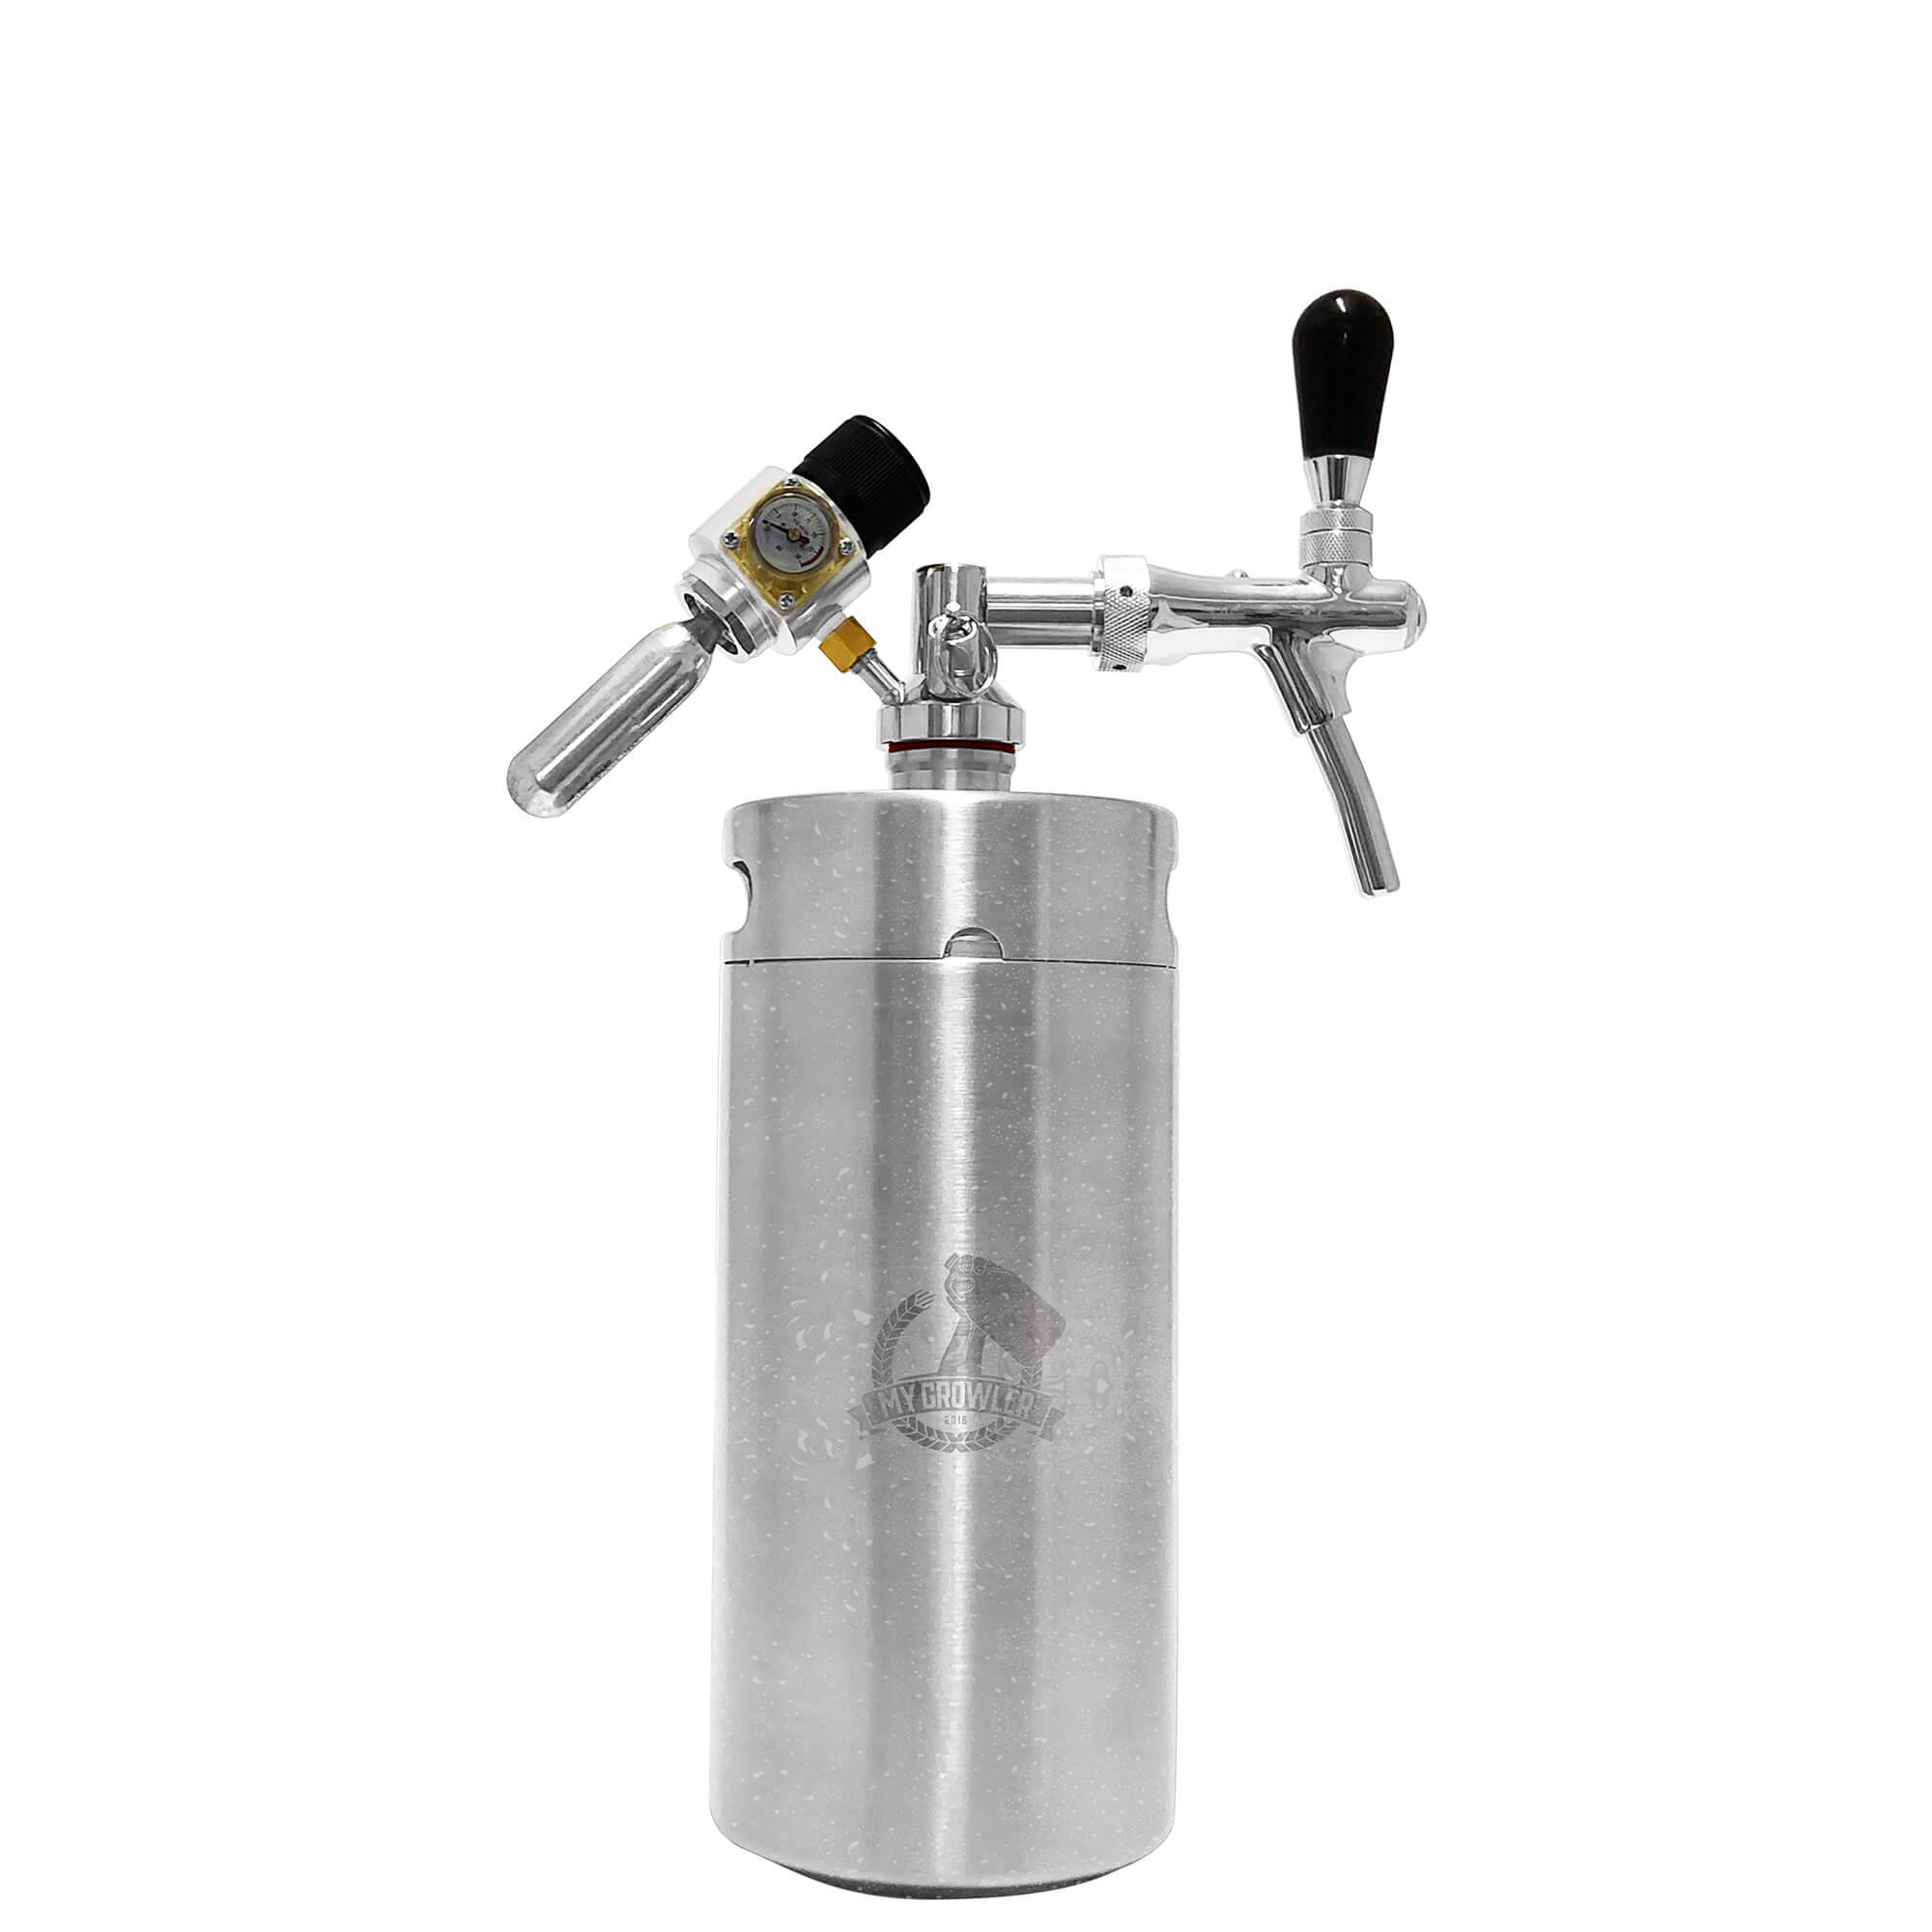 Kit My Keg, Growler Inox 3,8L com torneira italiana Premium